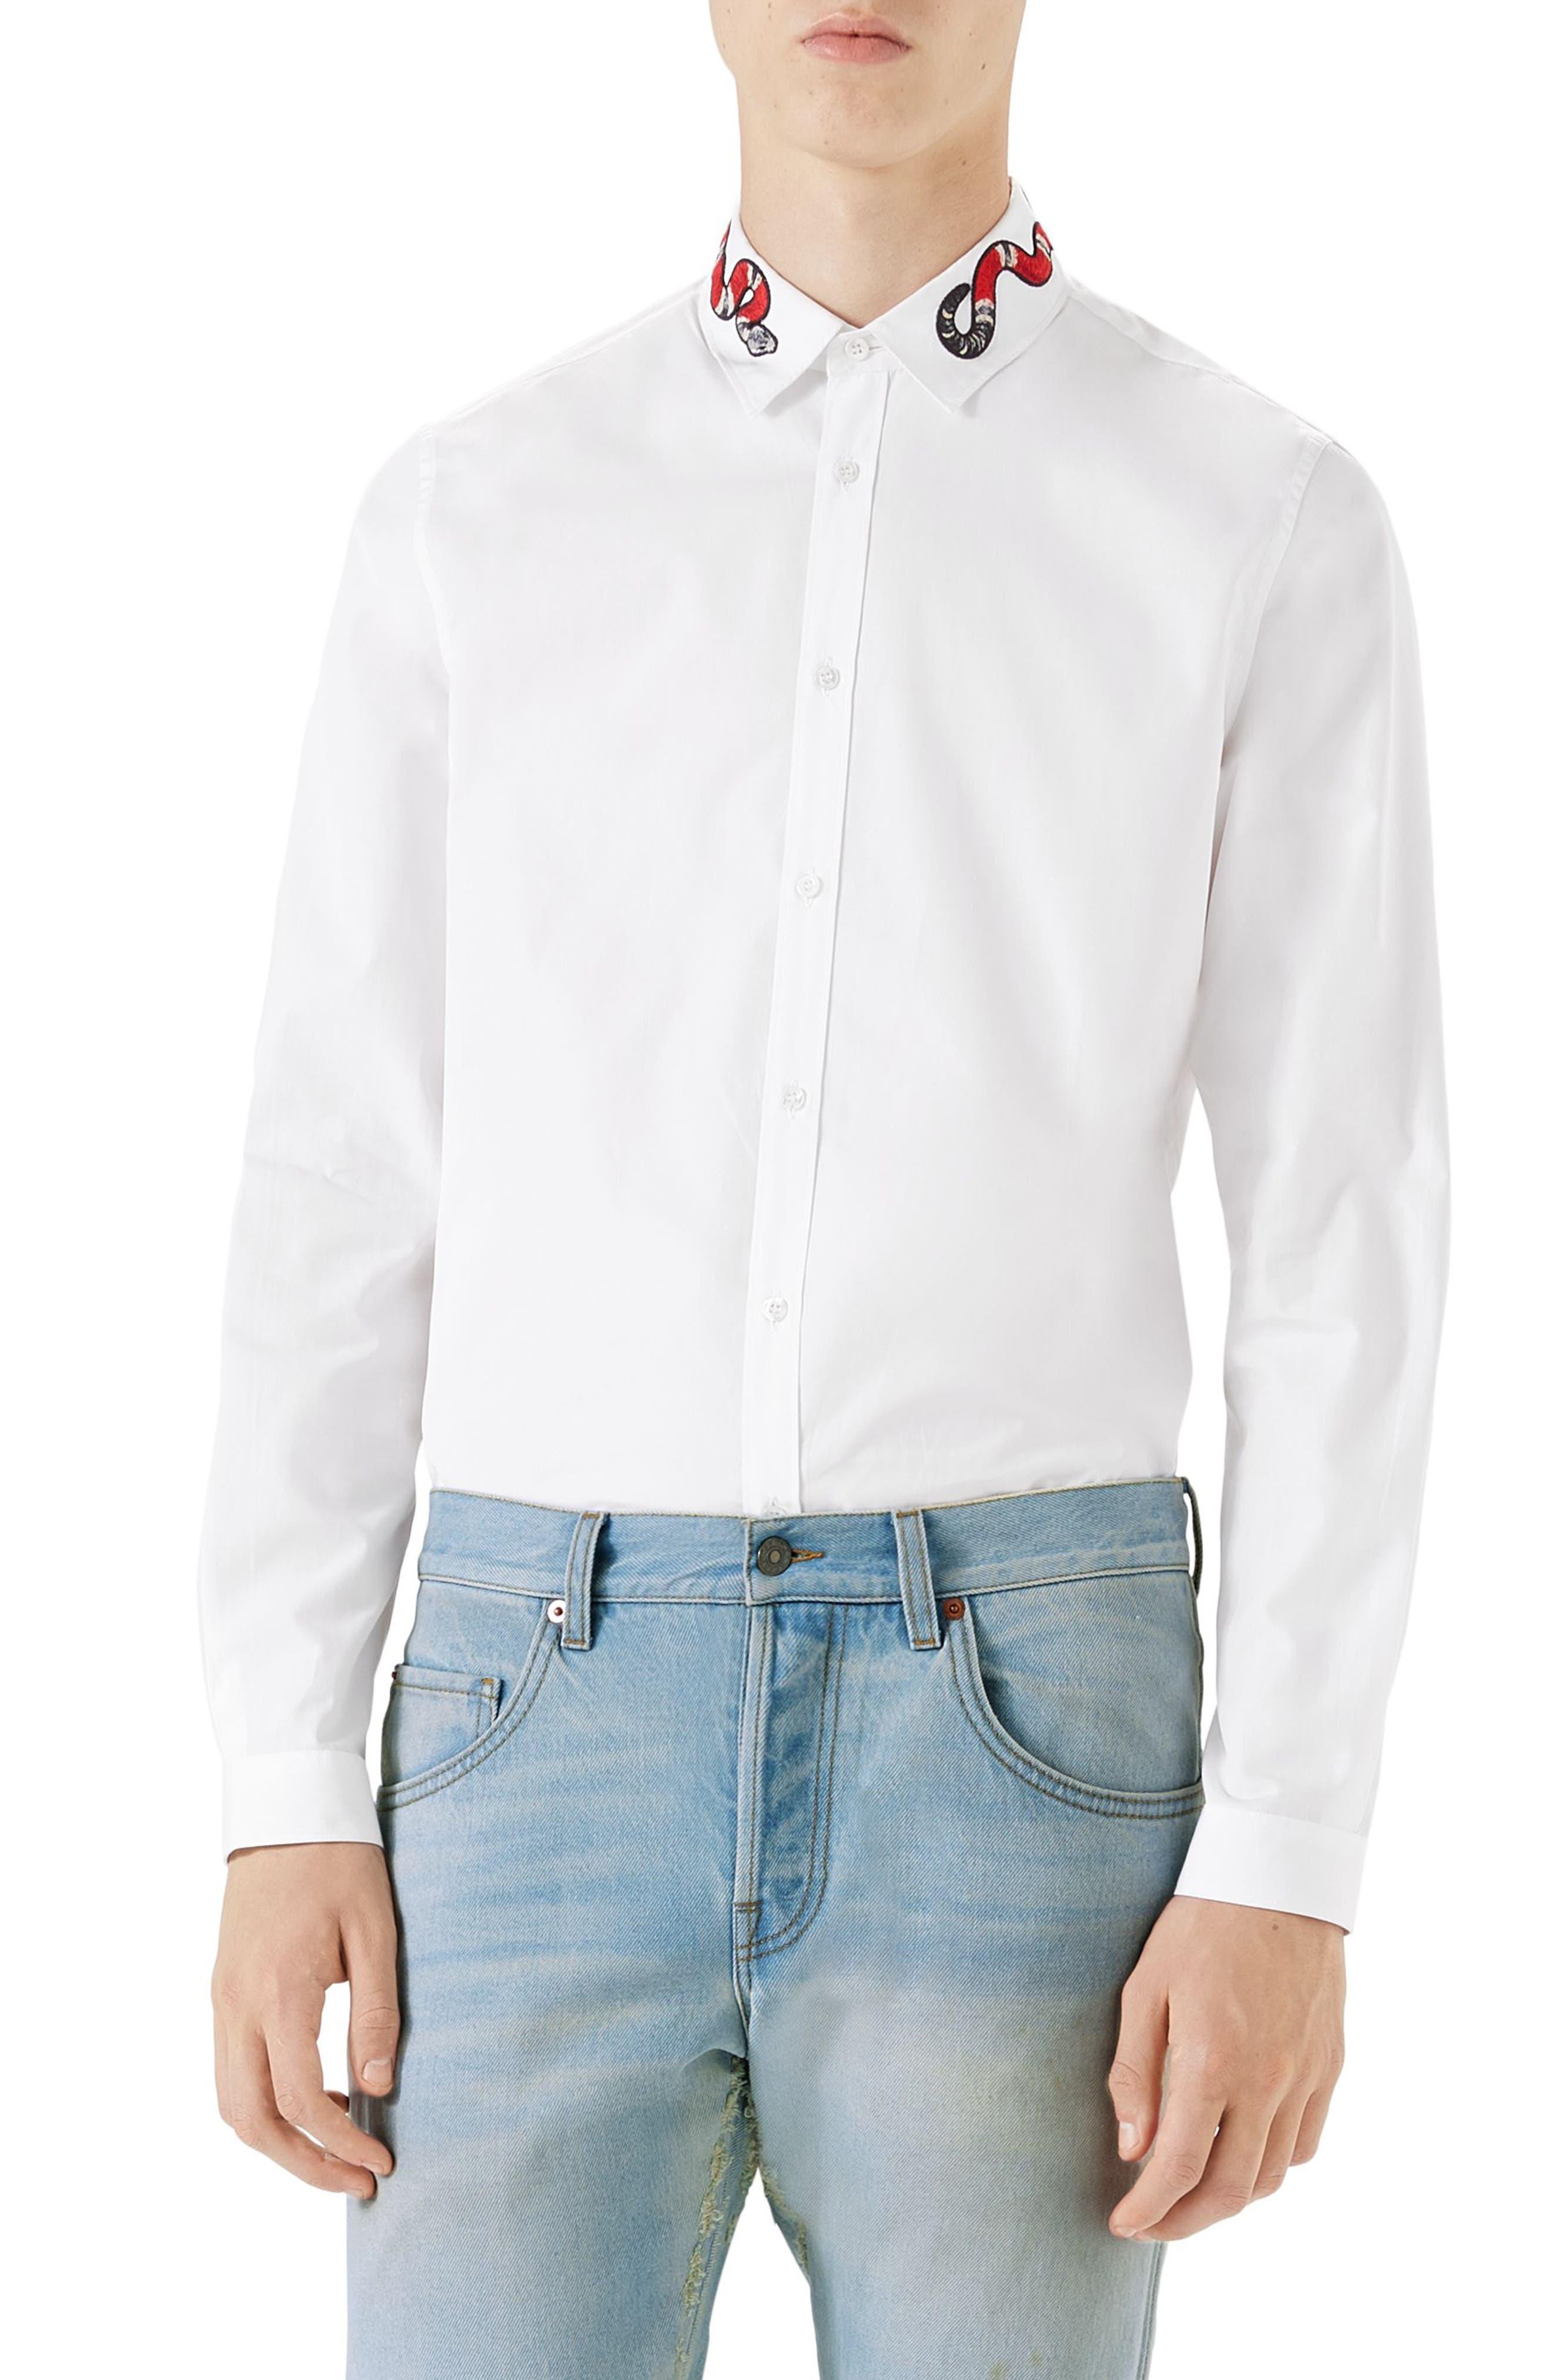 Snake Embroidered Collar Shirt,                             Main thumbnail 1, color,                             White